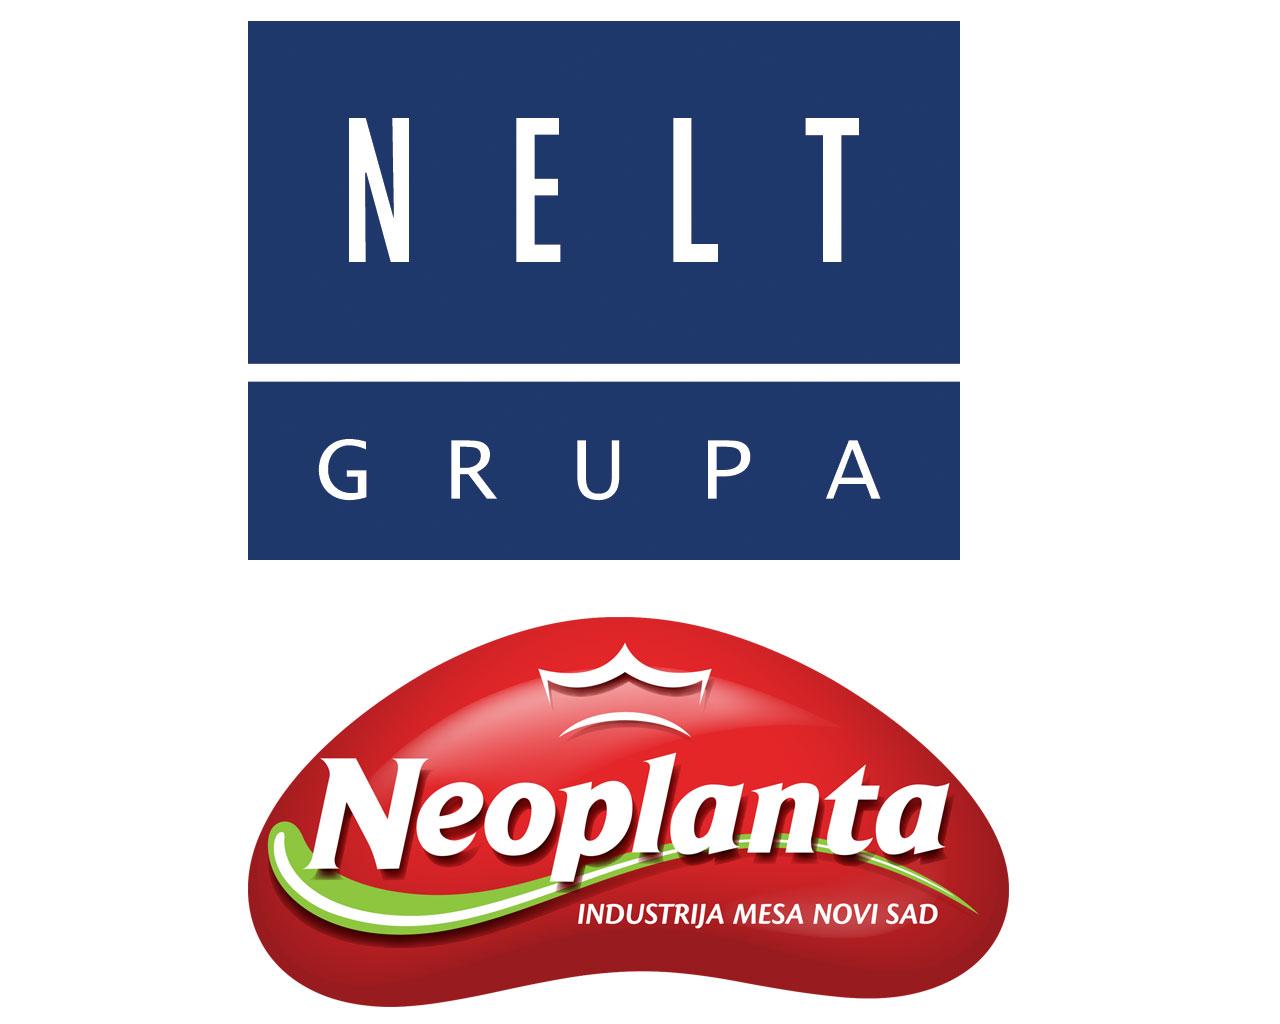 neoplanta-i-nelt-logo